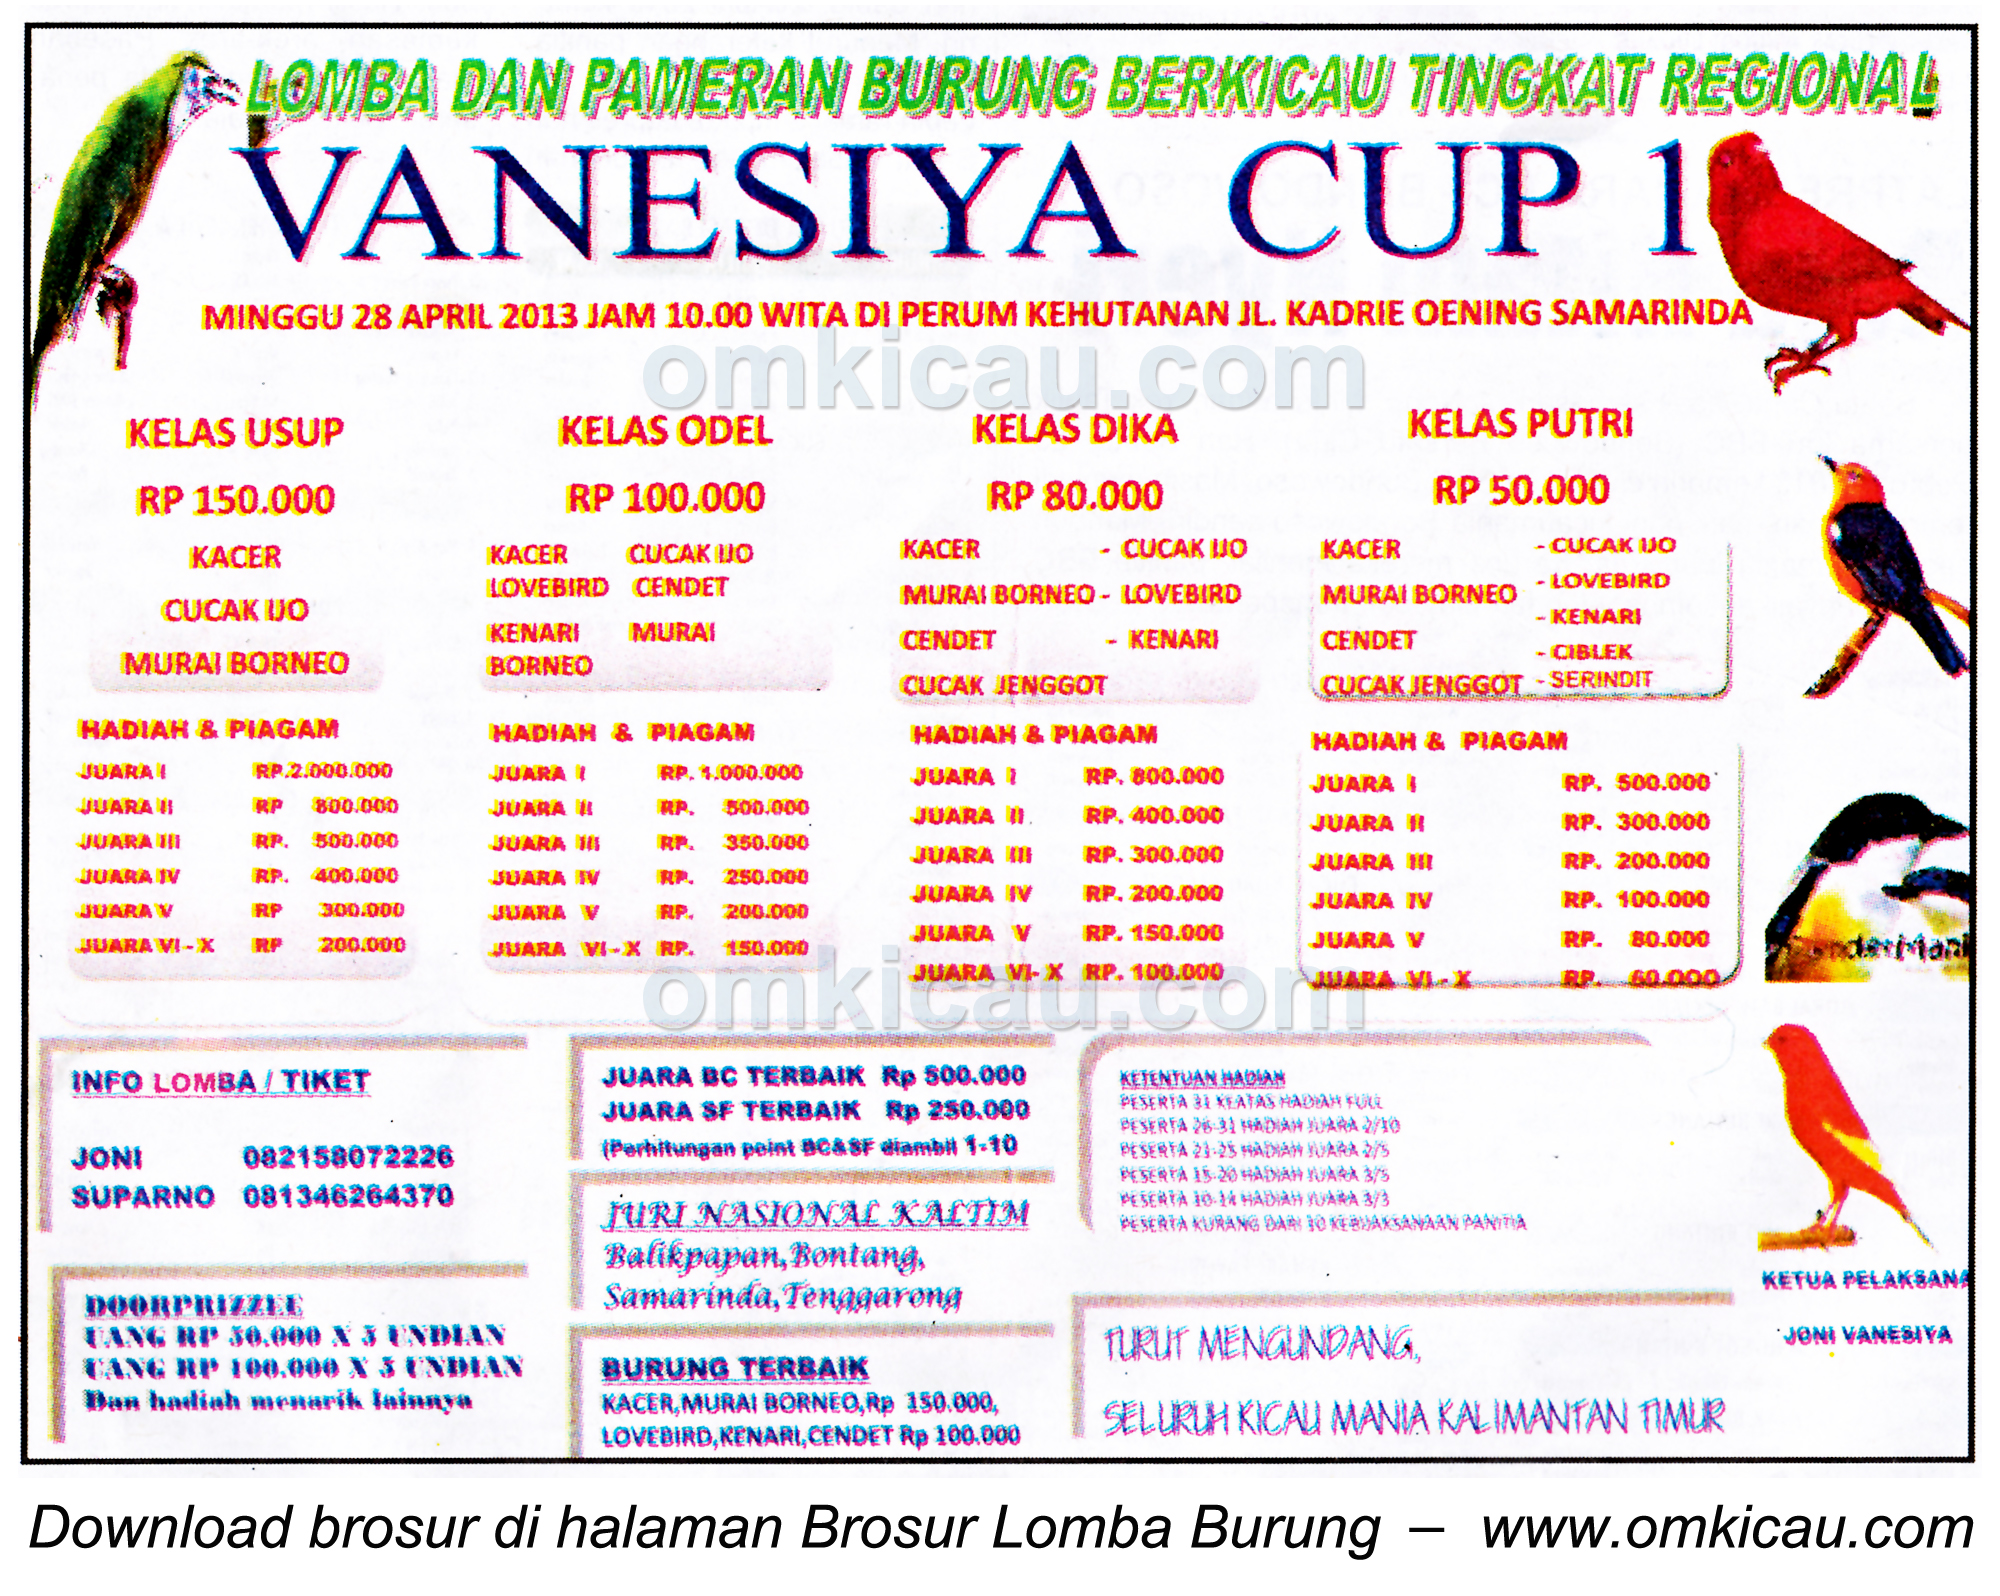 Brosur Lomba Burung Vanesiya Cup I - Samarinda - 28 April 2013